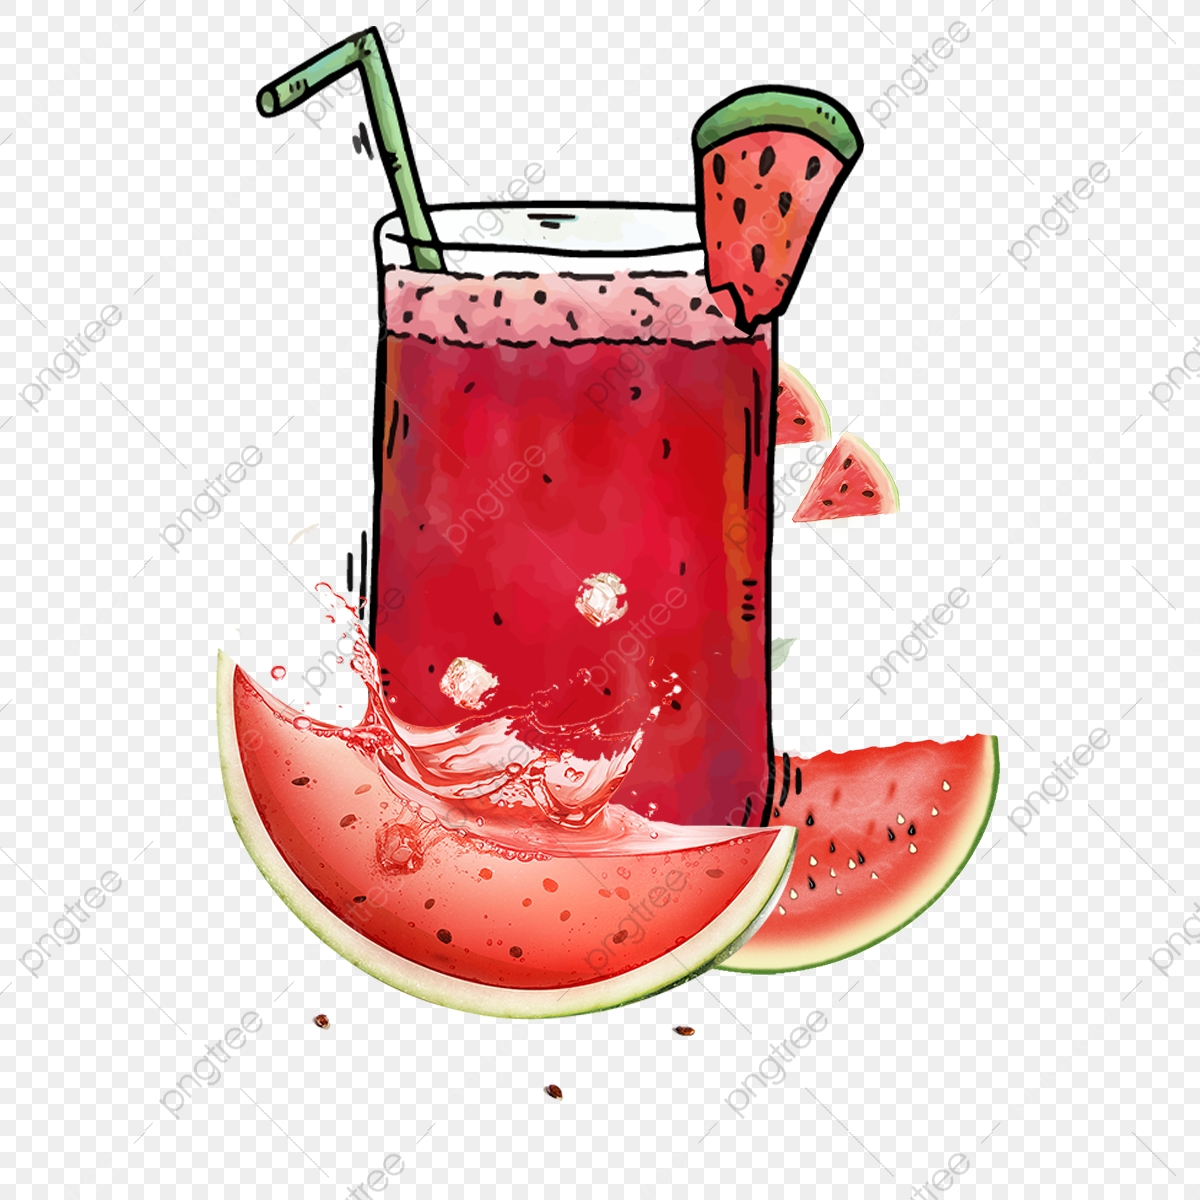 Watermelon clipart juices. Lemon juice poster afternoon